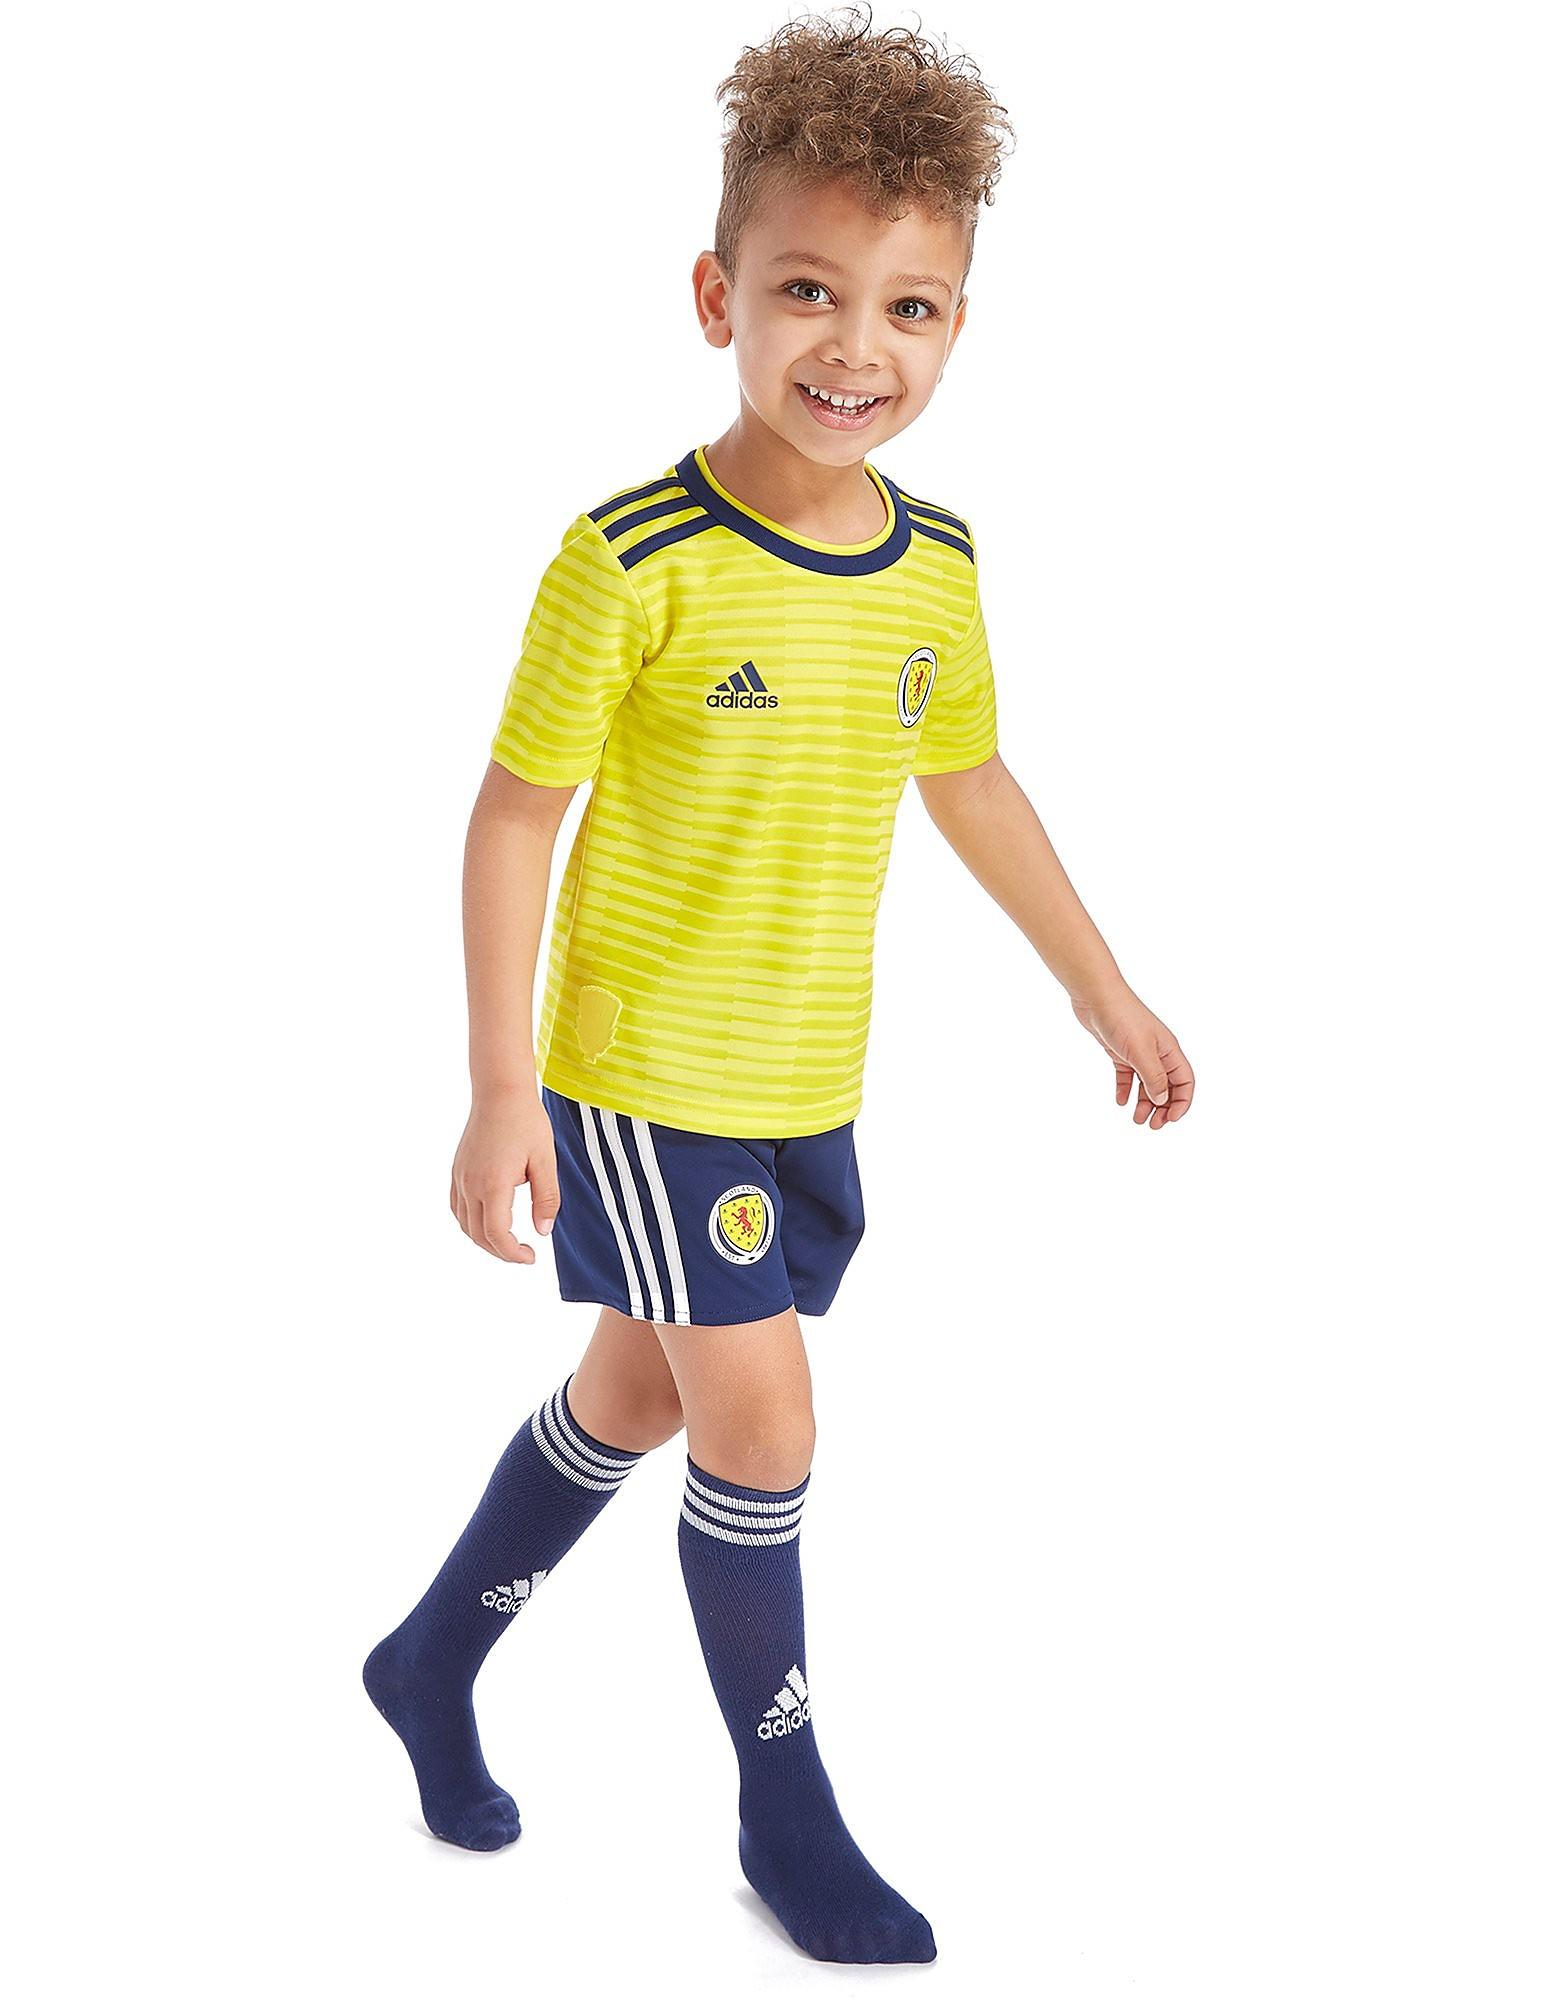 adidas conjunto Escocia 2018 2.ª equipación infantil